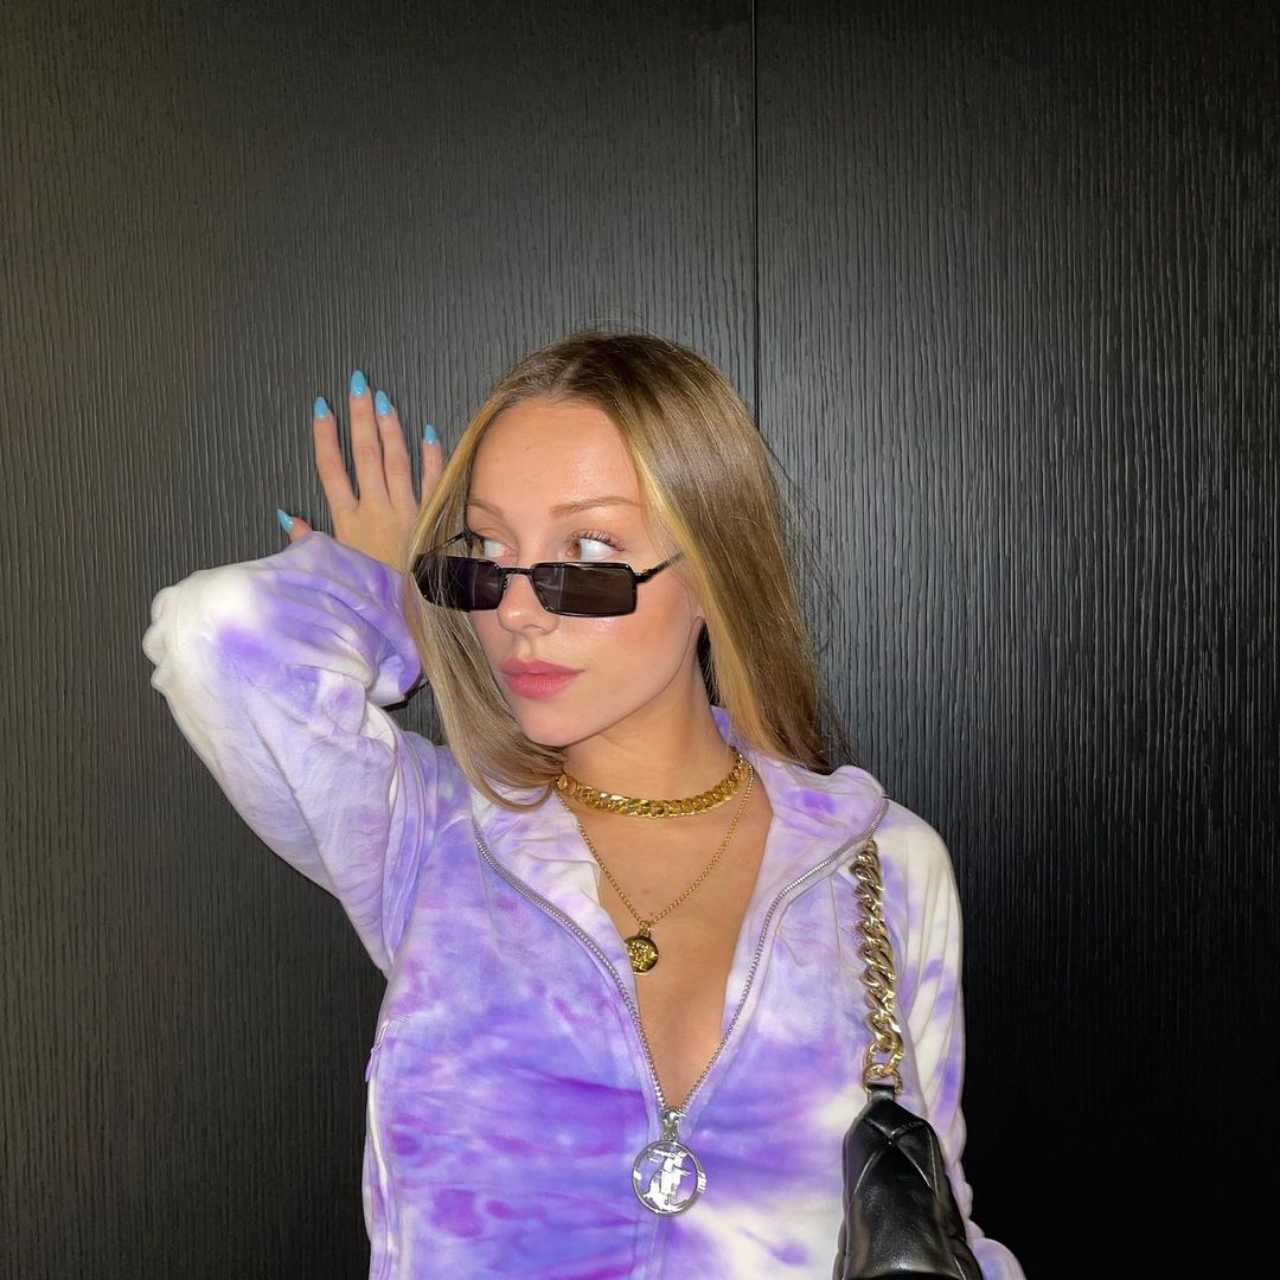 Ester Exposito posando con bolsa y lentes